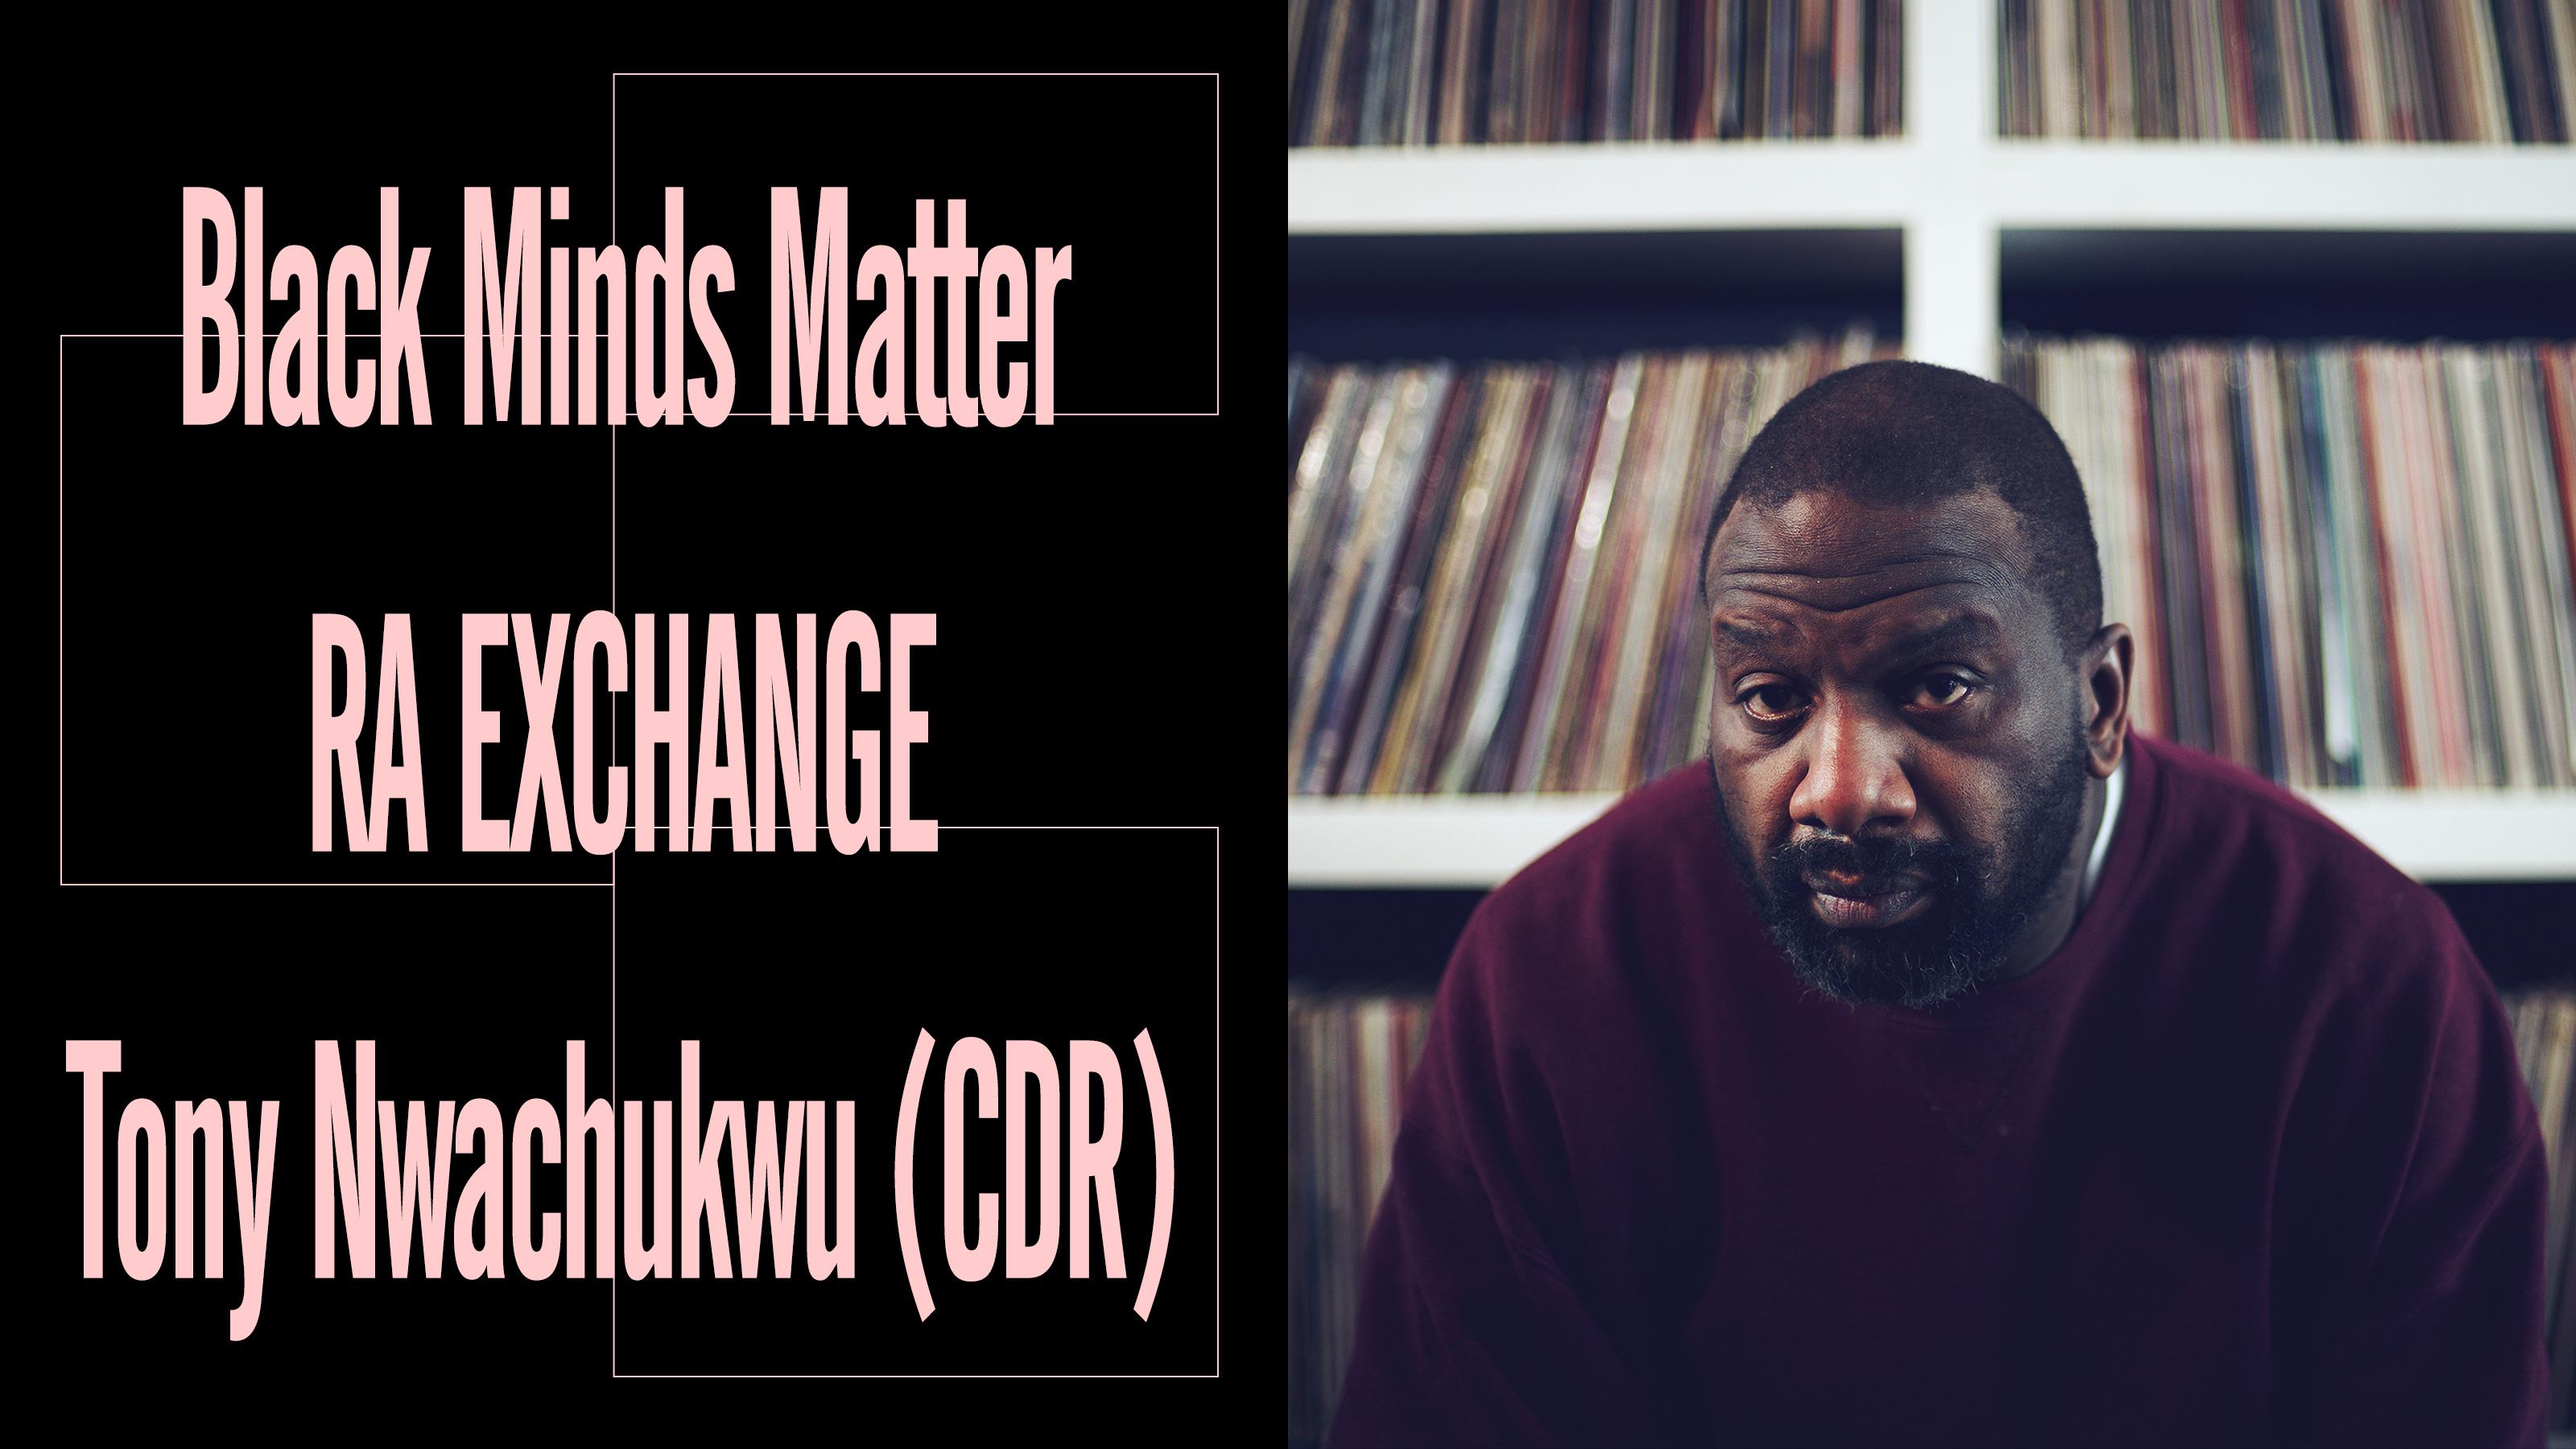 Black Minds Matter UK x RA Exchange: Tony Nwachukwu (CDR)